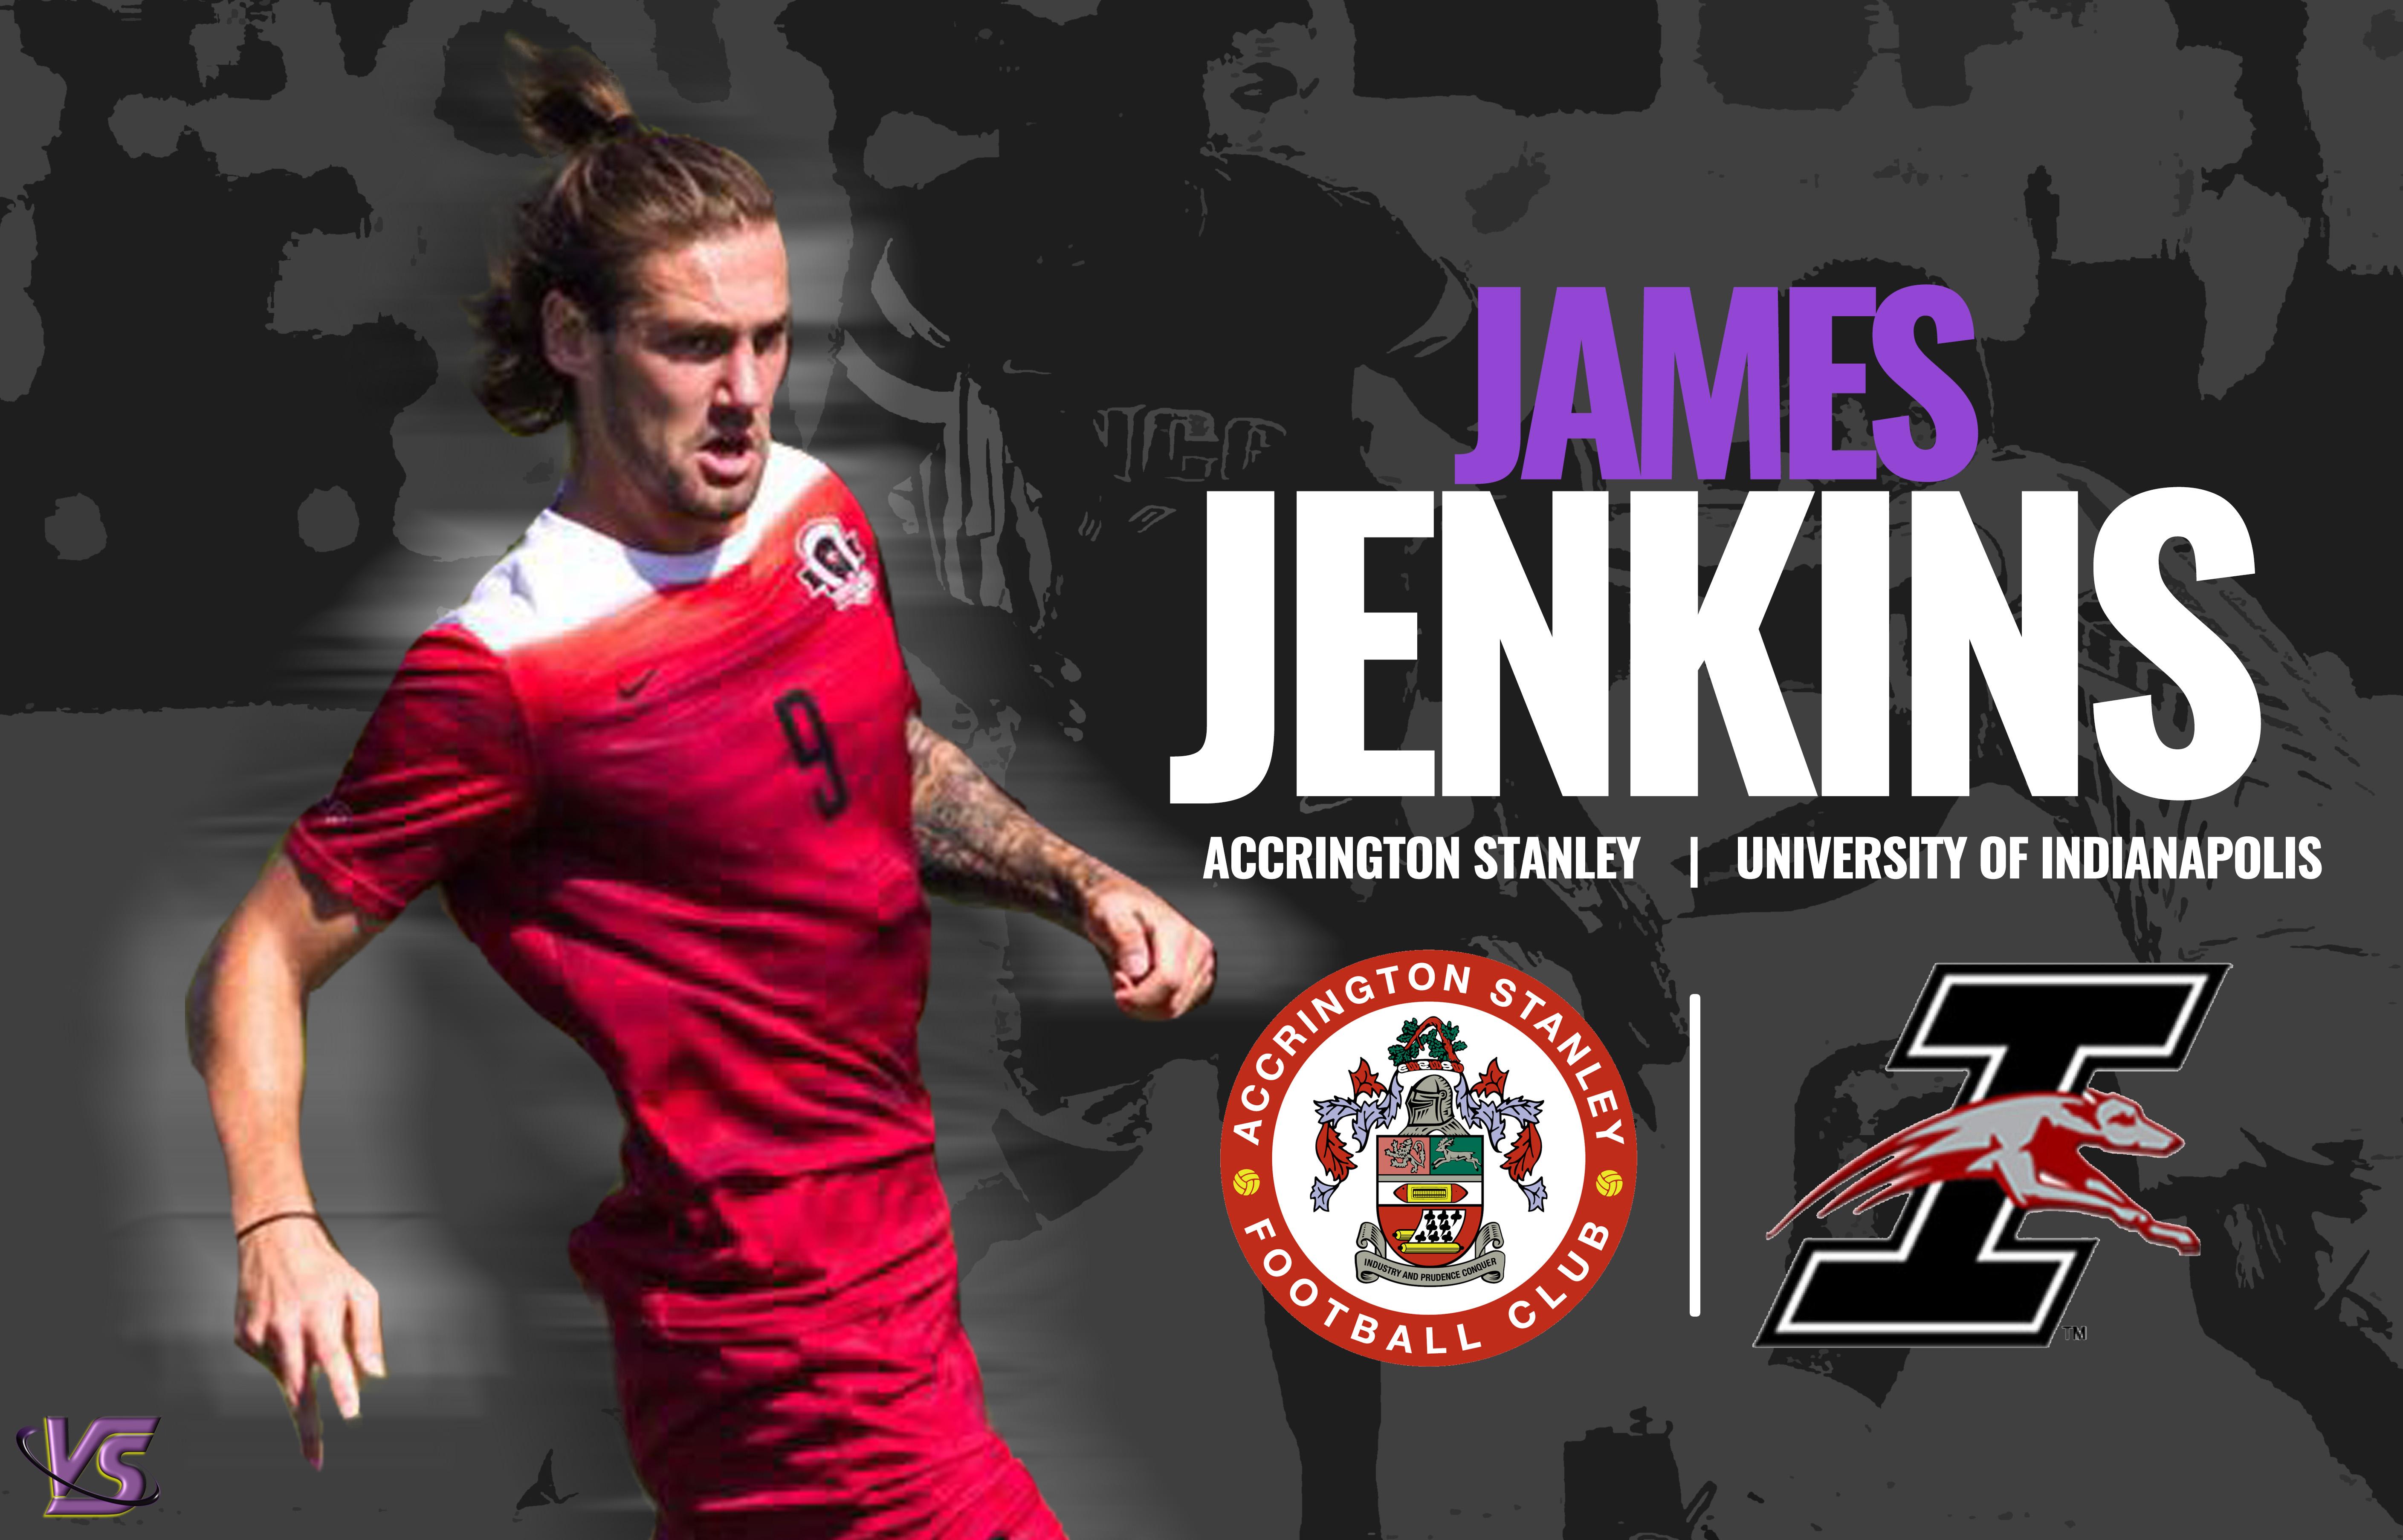 James Jenkins 2016